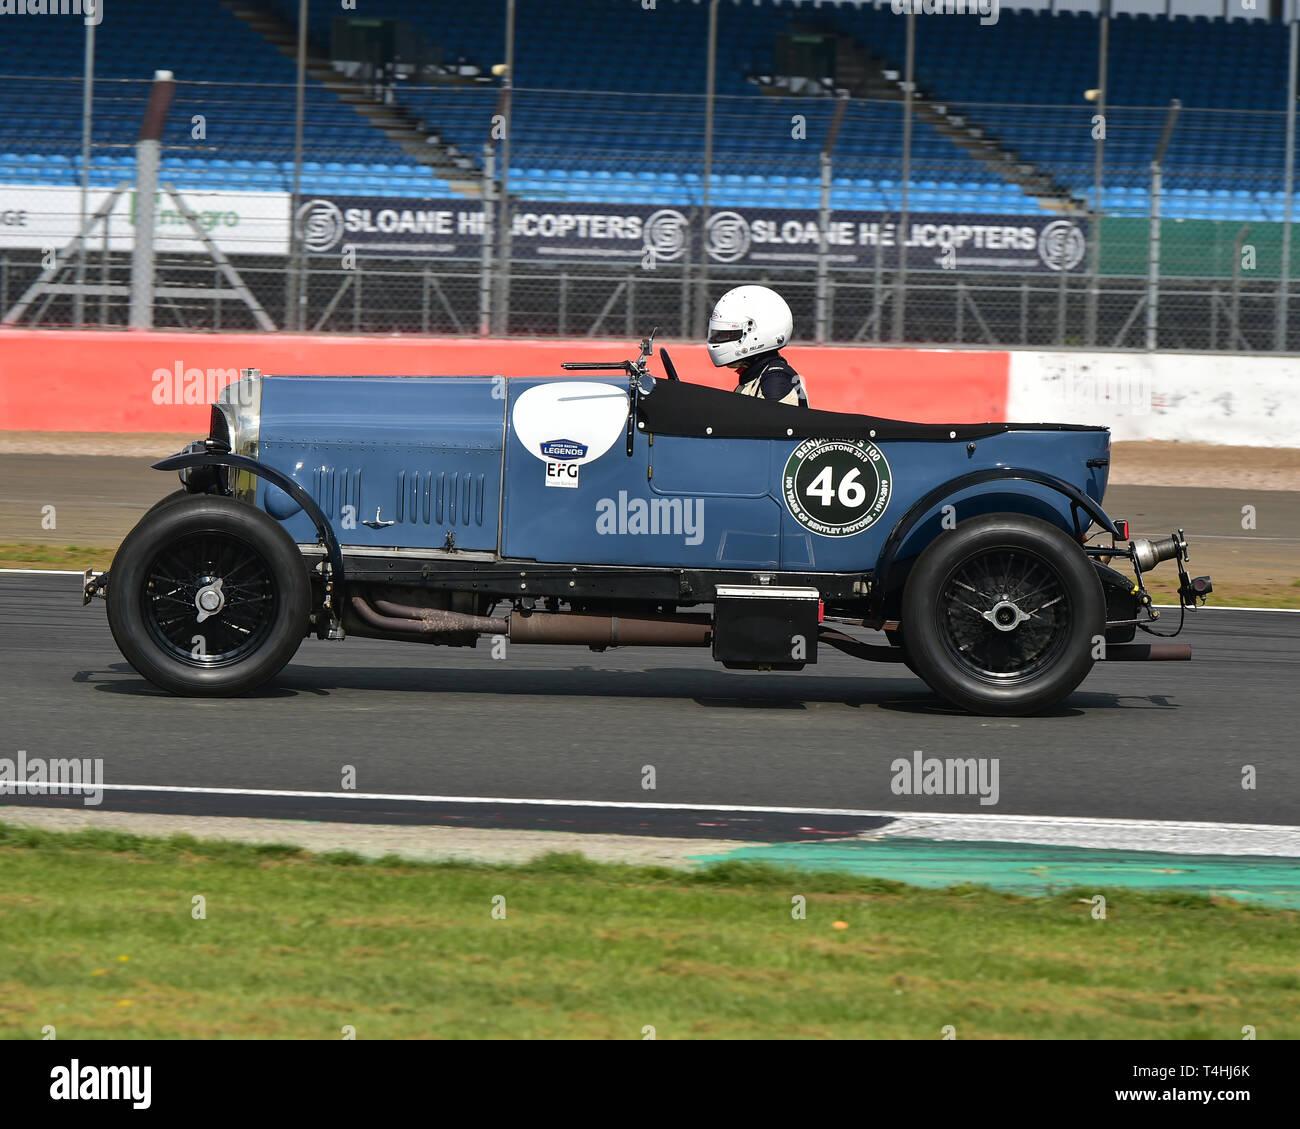 Duncan Wiltshire, Clive Morley, Bentley 3 litre, Benjafield 100, 100 Years of Bentley, April 2019,  Silverstone, Northamptonshire, England, circuit ra - Stock Image